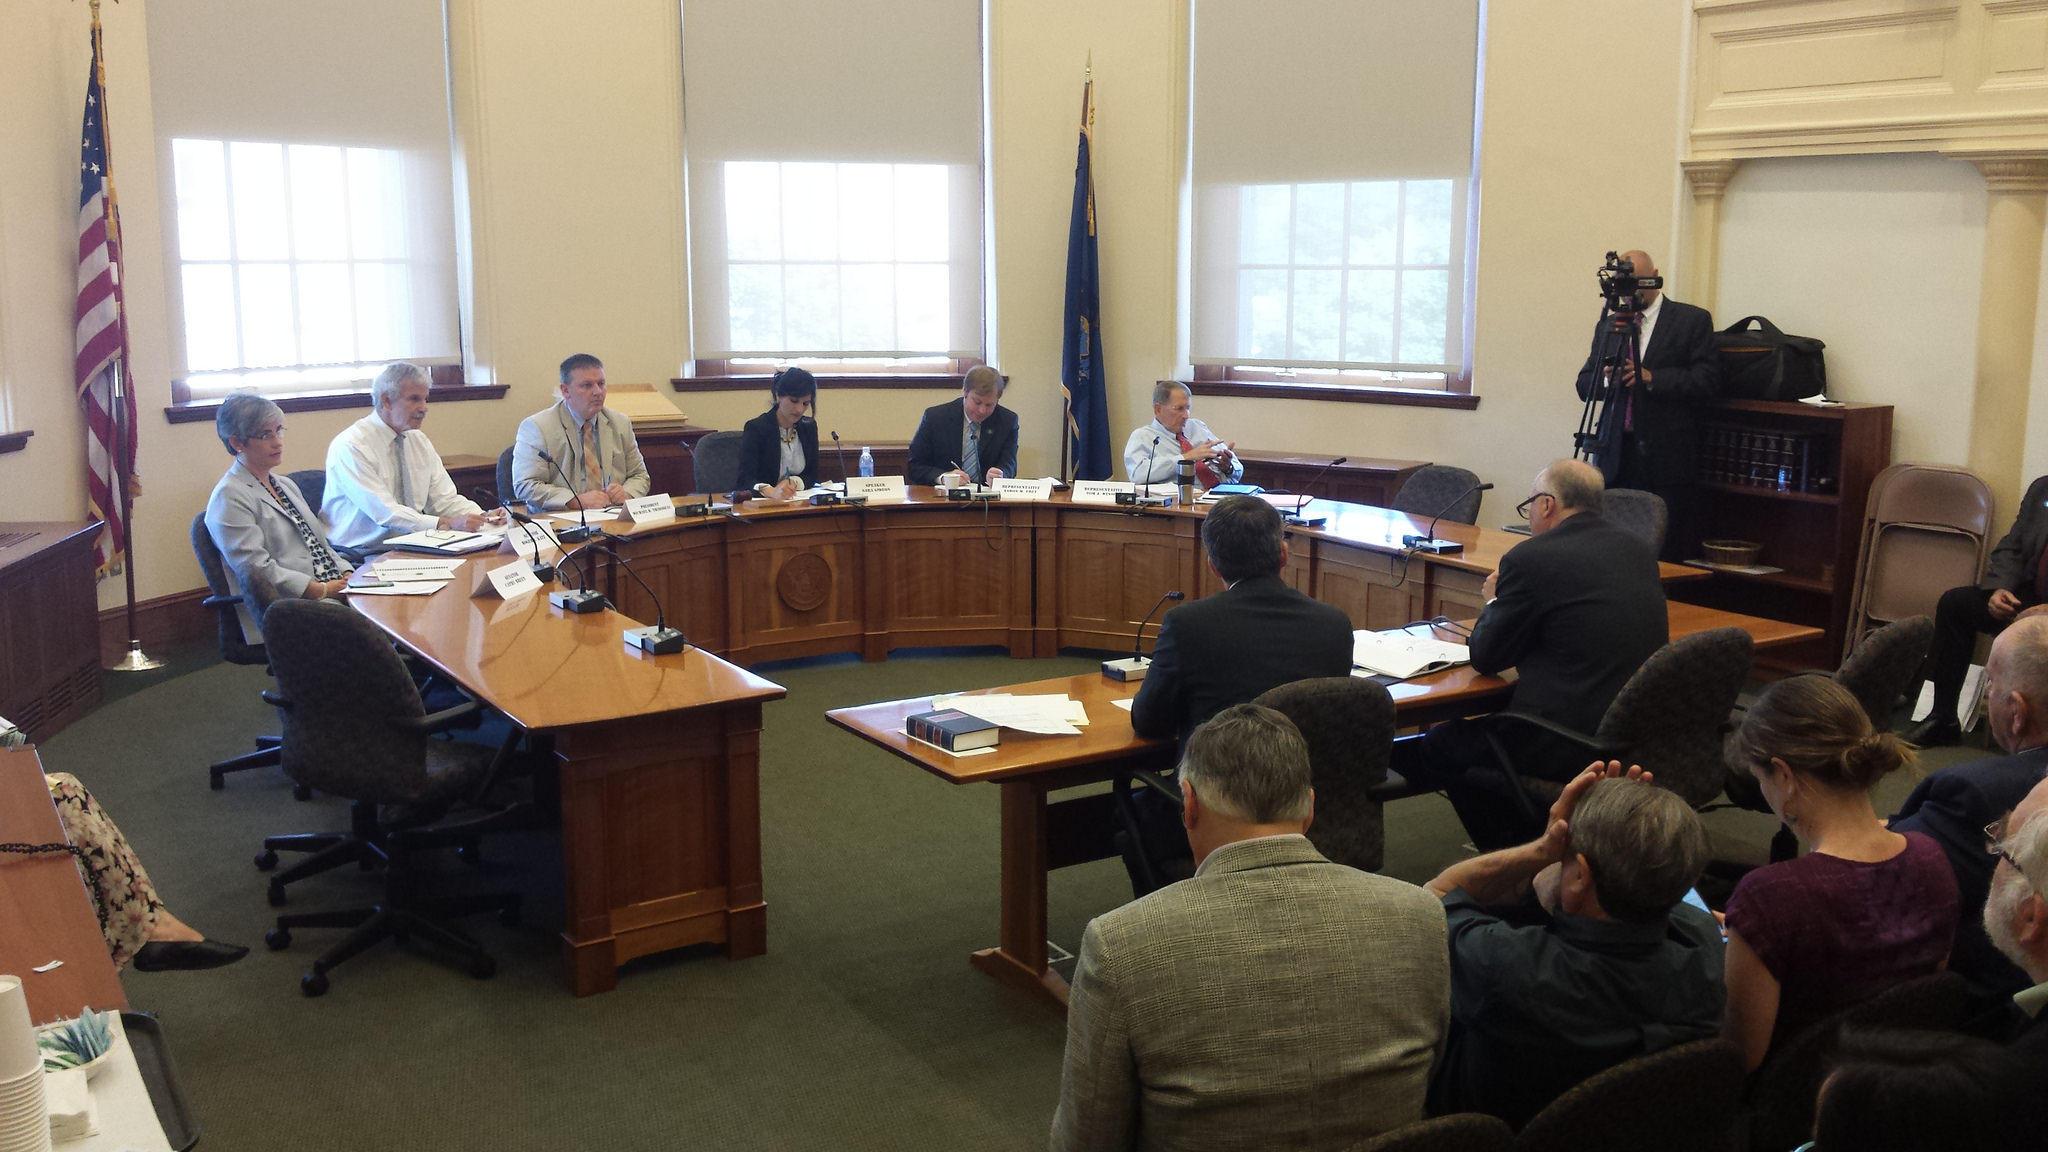 Maine Legislative Leaders Strike Budget Deal as Shutdown Looms